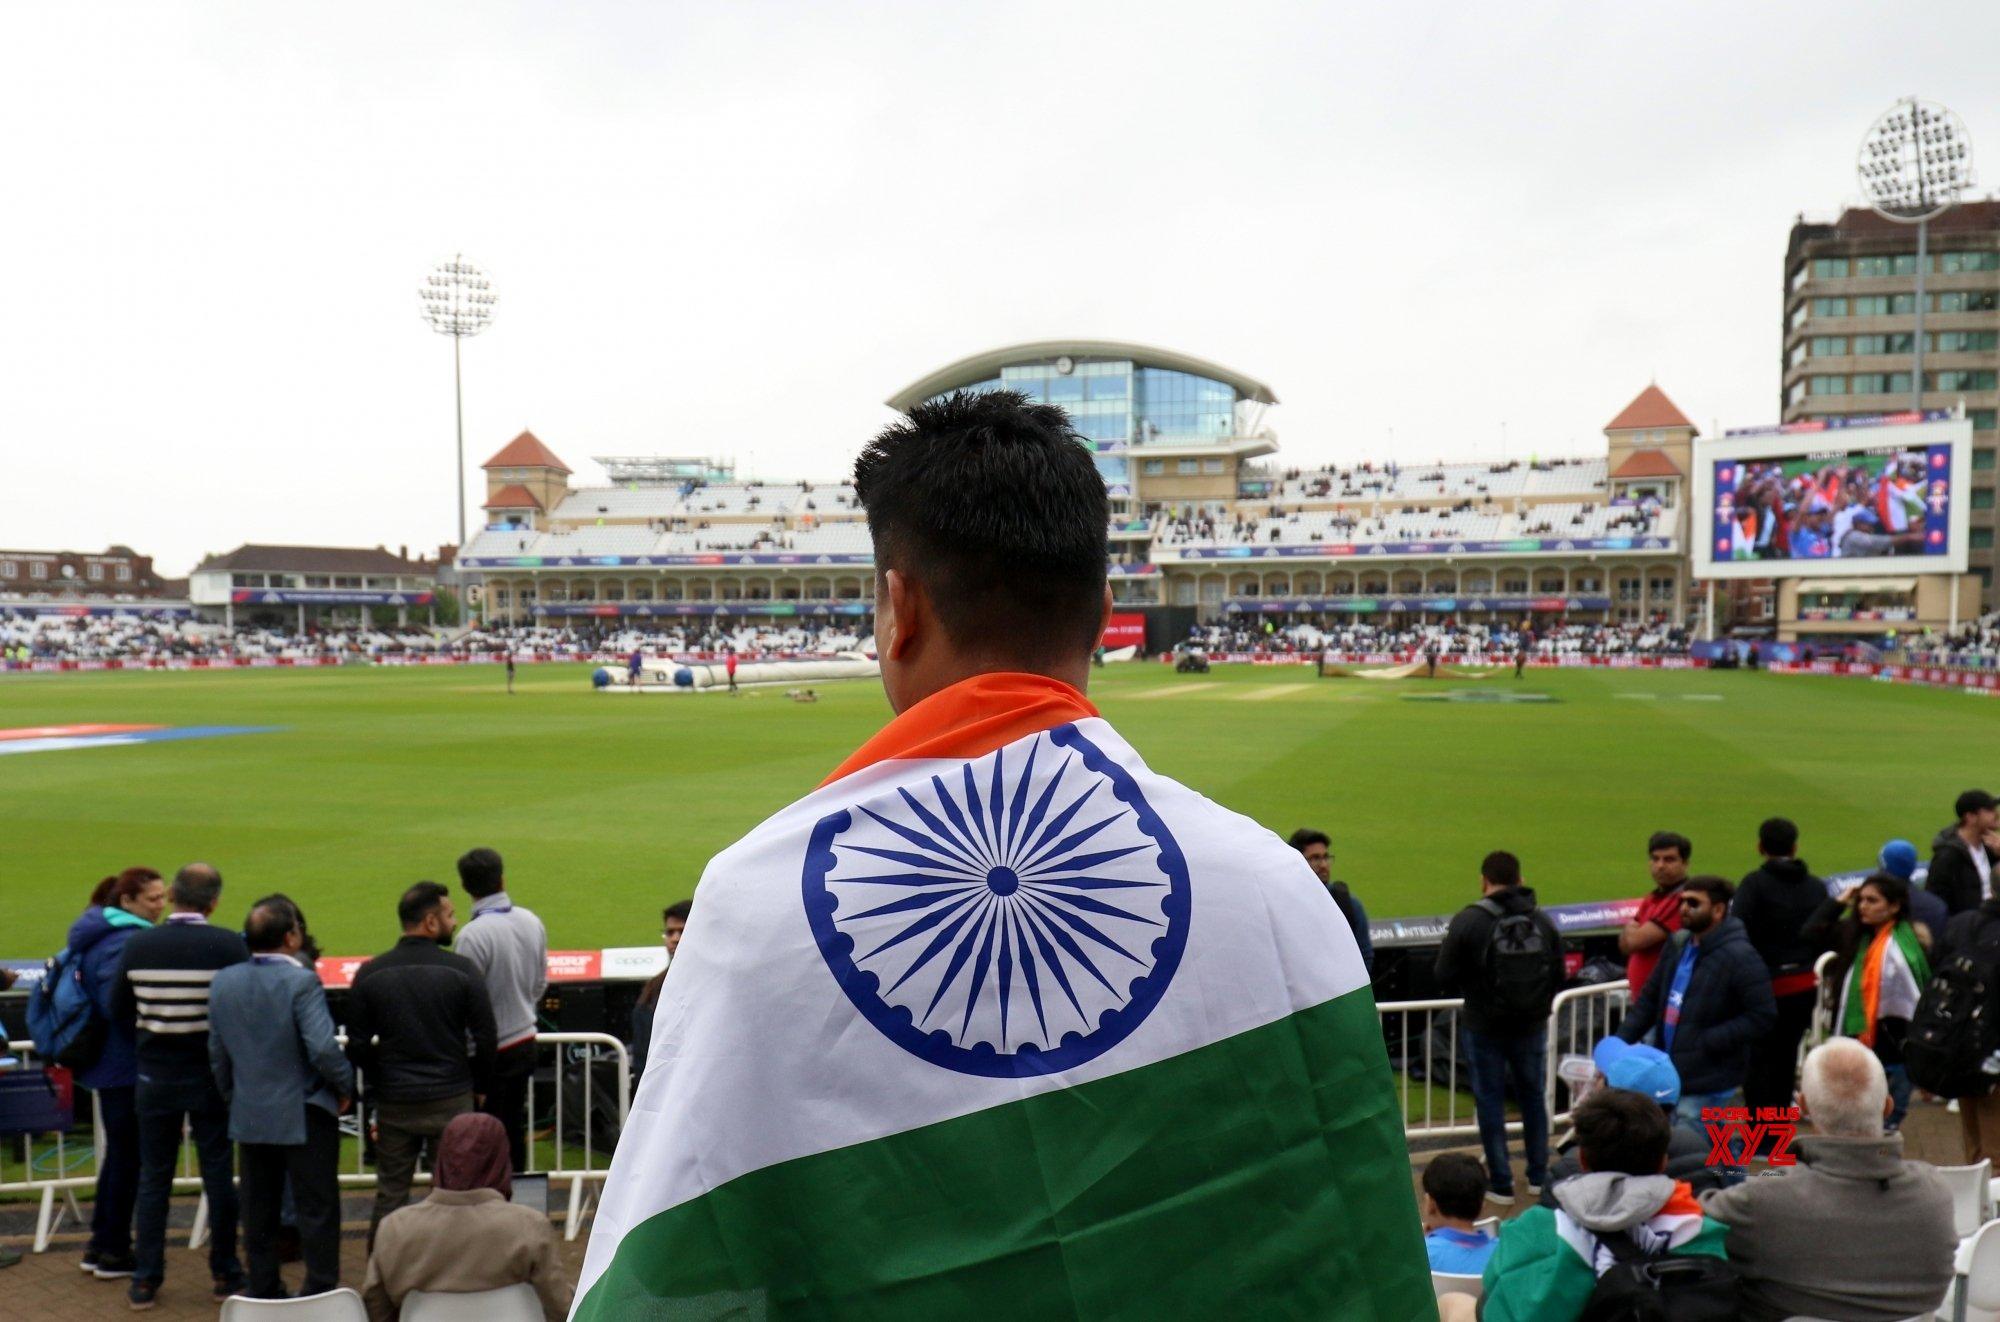 Nottingham (England): World Cup 2019 - Match 18 - India Vs New Zealand (Batch - 4) #Gallery